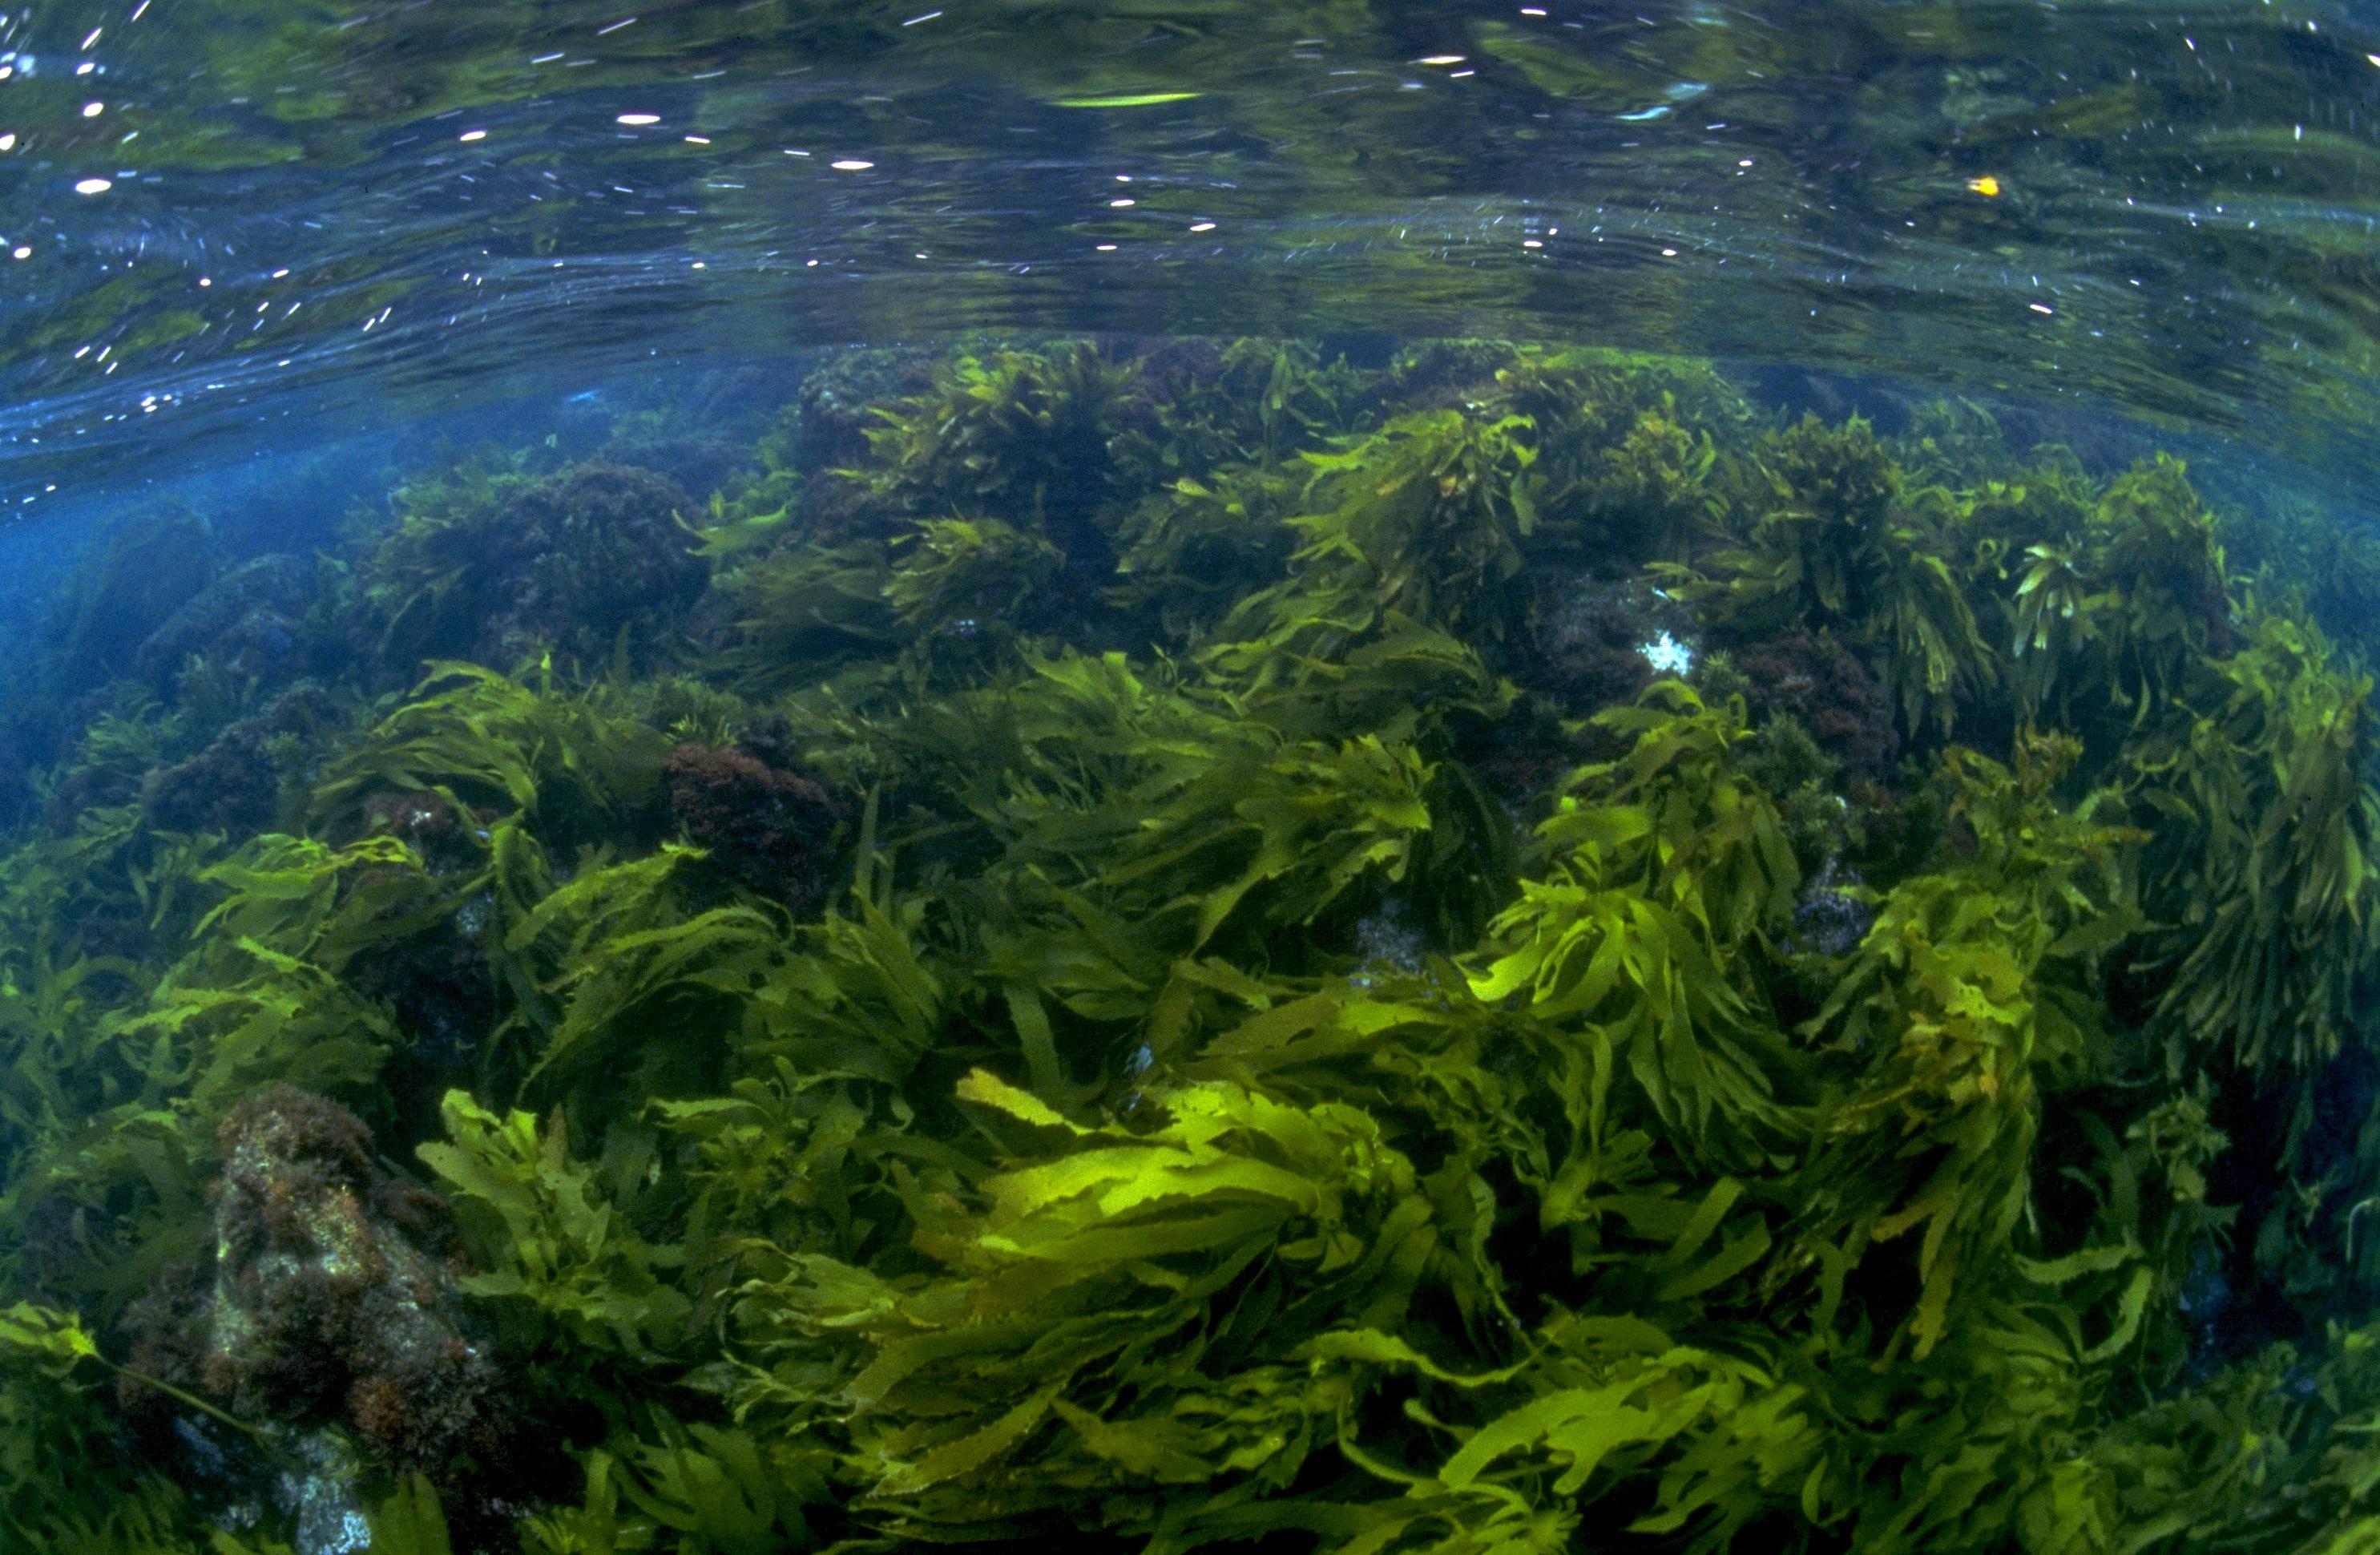 Ecklonia radiata (Leather Kelp), Pope's Eye. Photographer: Mary Malloy